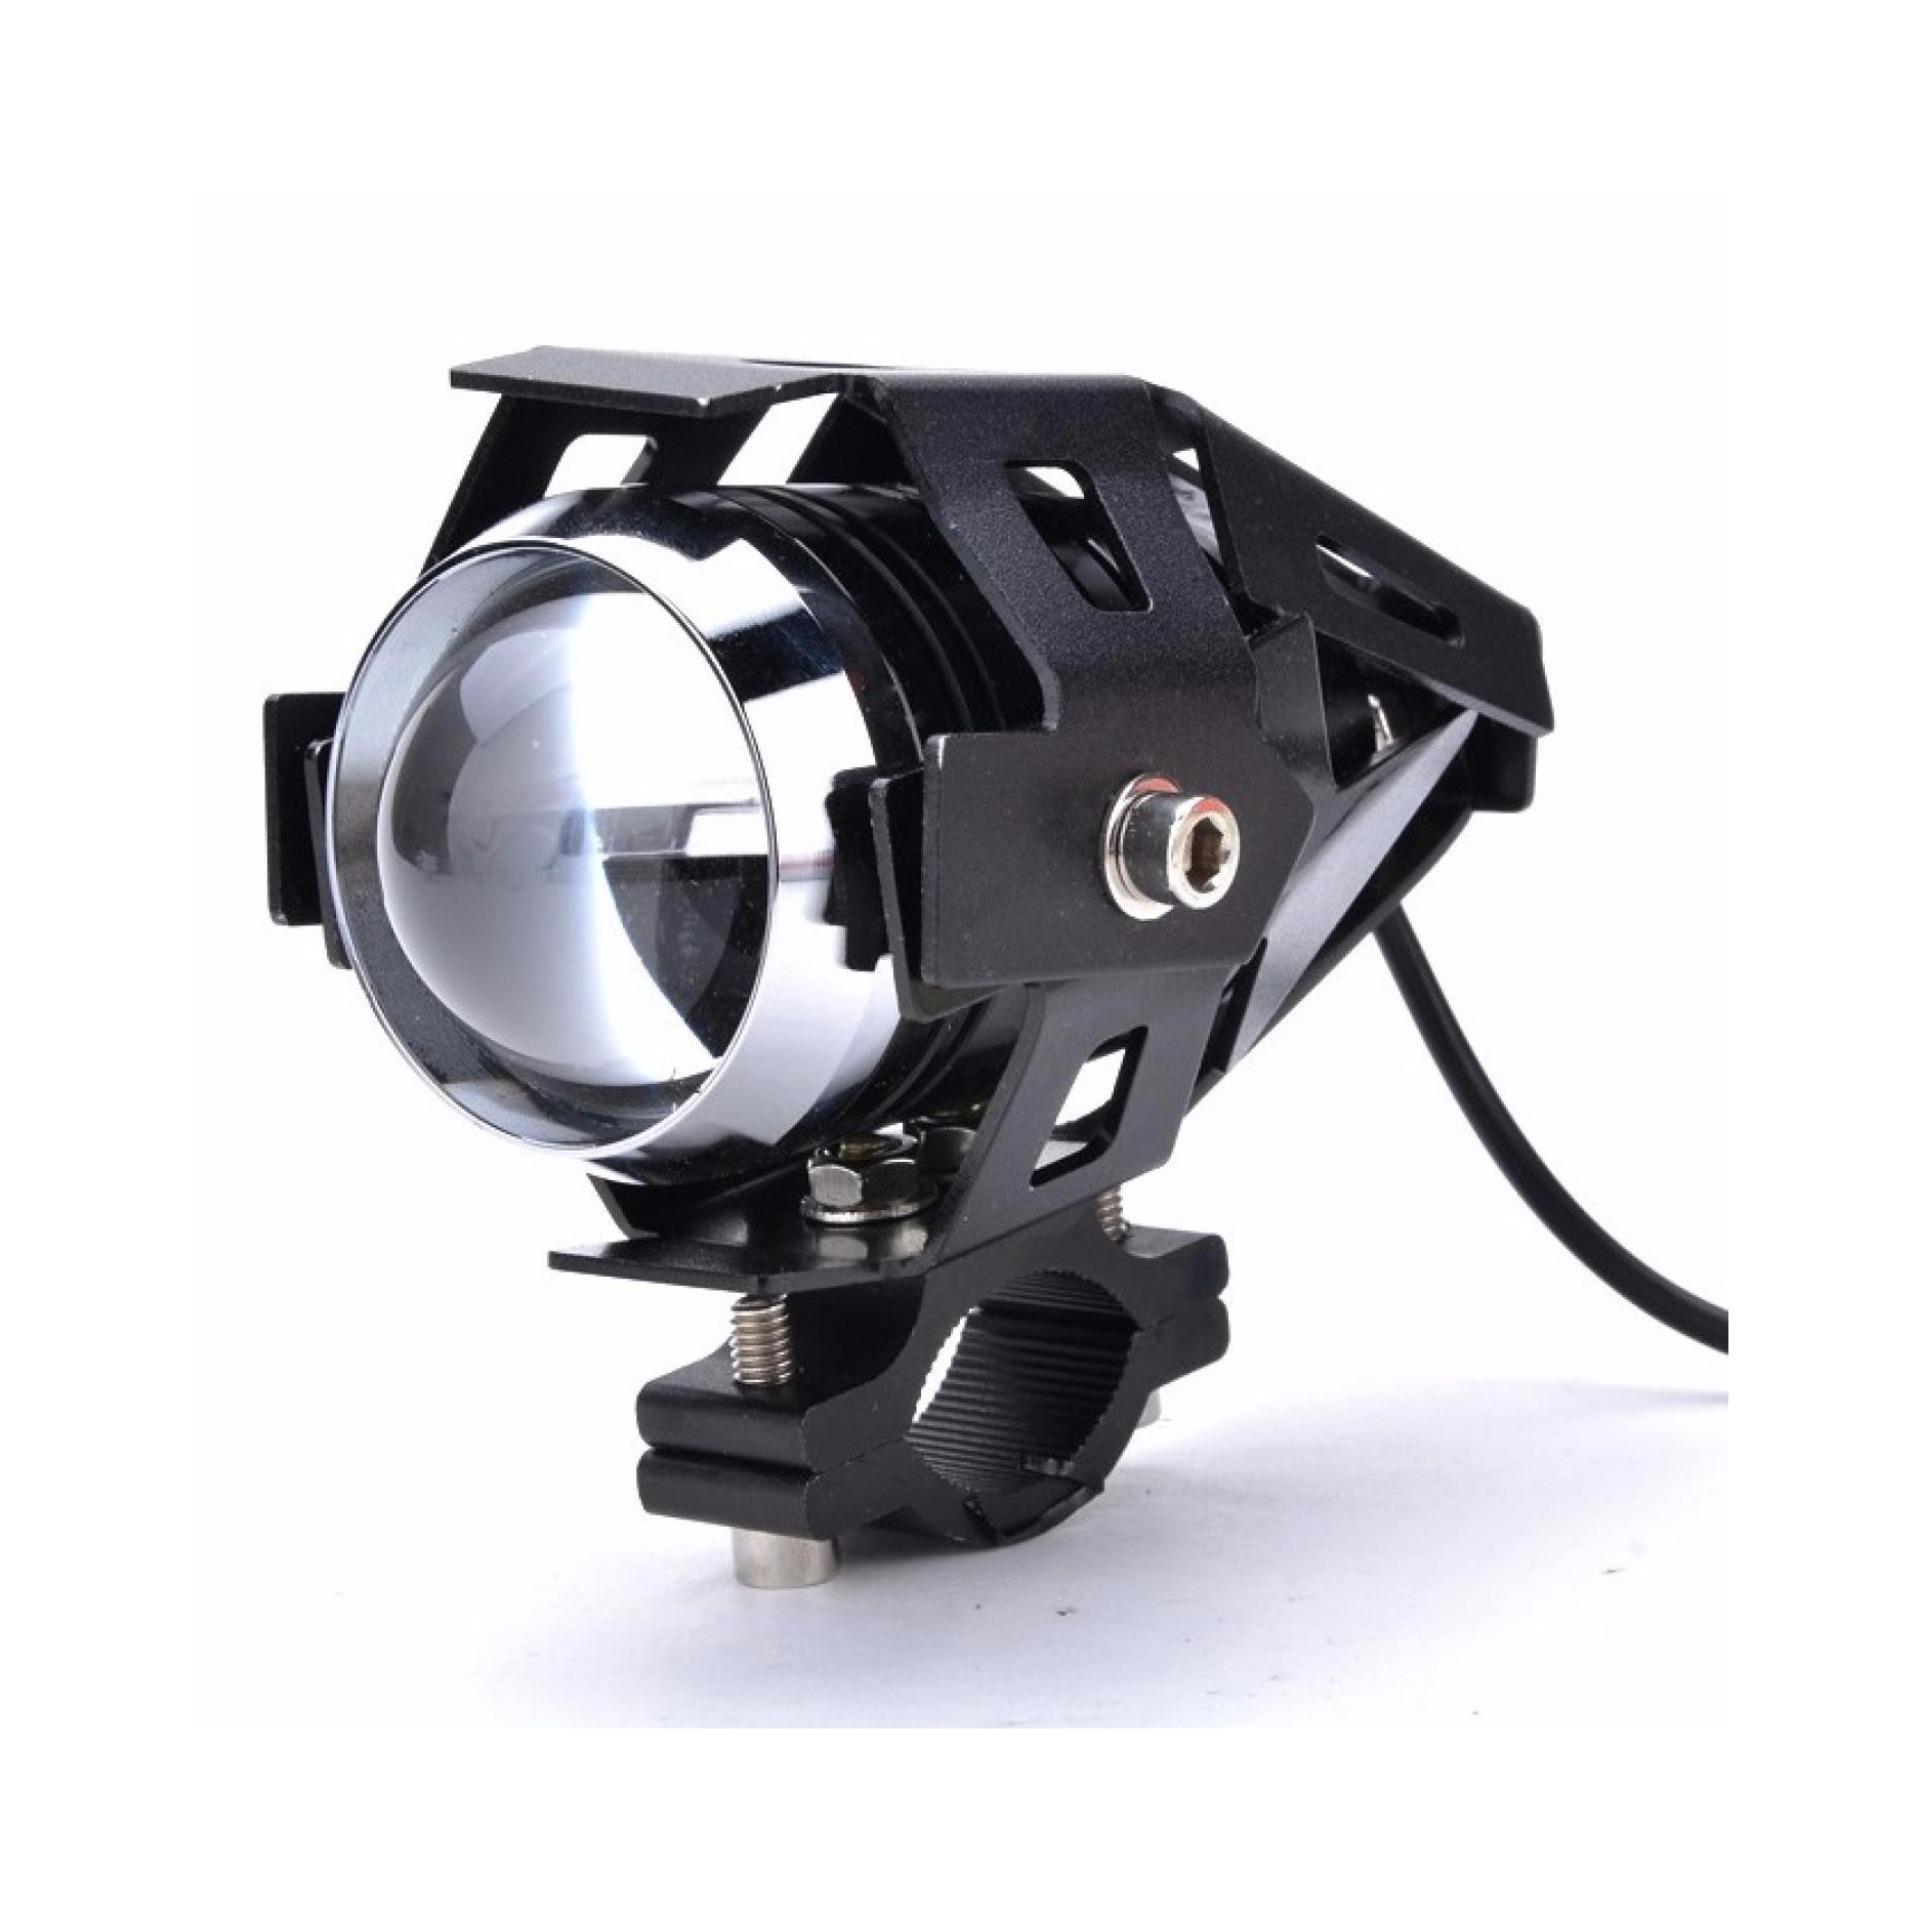 U8 Led Lampu Sorot Sepeda Motor Motorbike Headlight Tinggi Rendah Rockbros Hy Ld306 Bicycle Rechargeable 100 Lm Beam Black